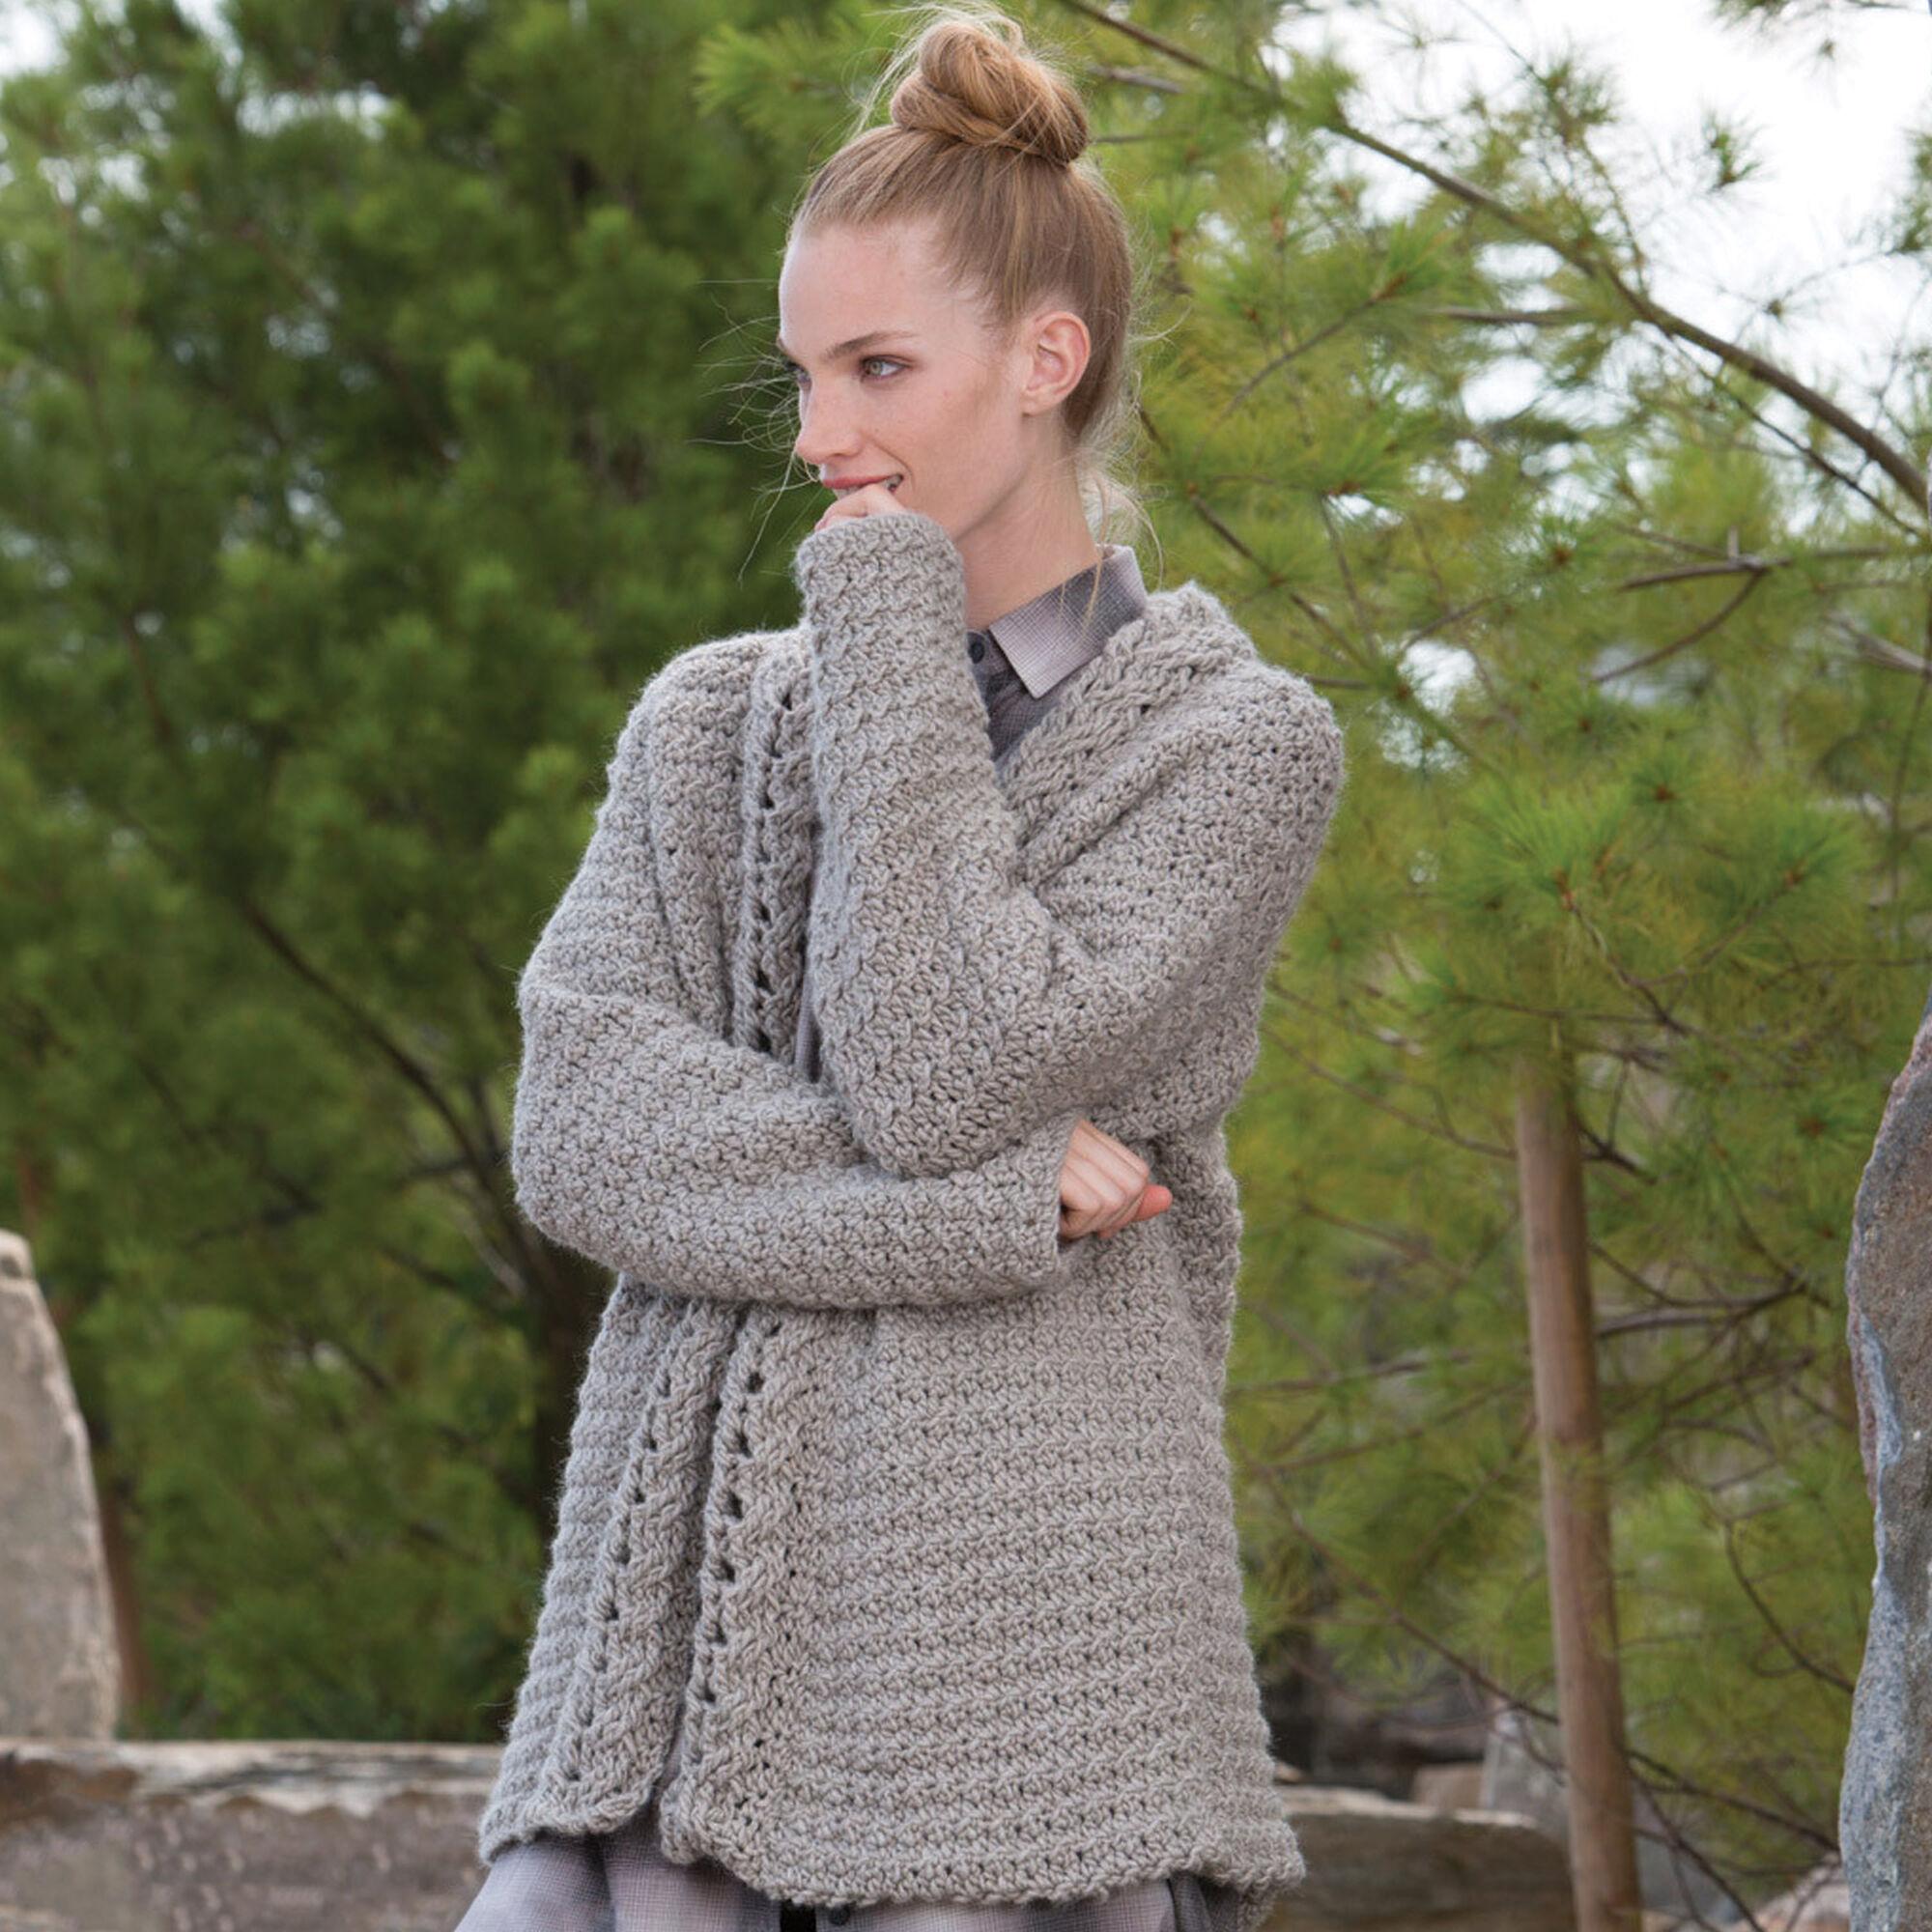 73543c714365 ... Patons Slouchy Crochet Cardigan